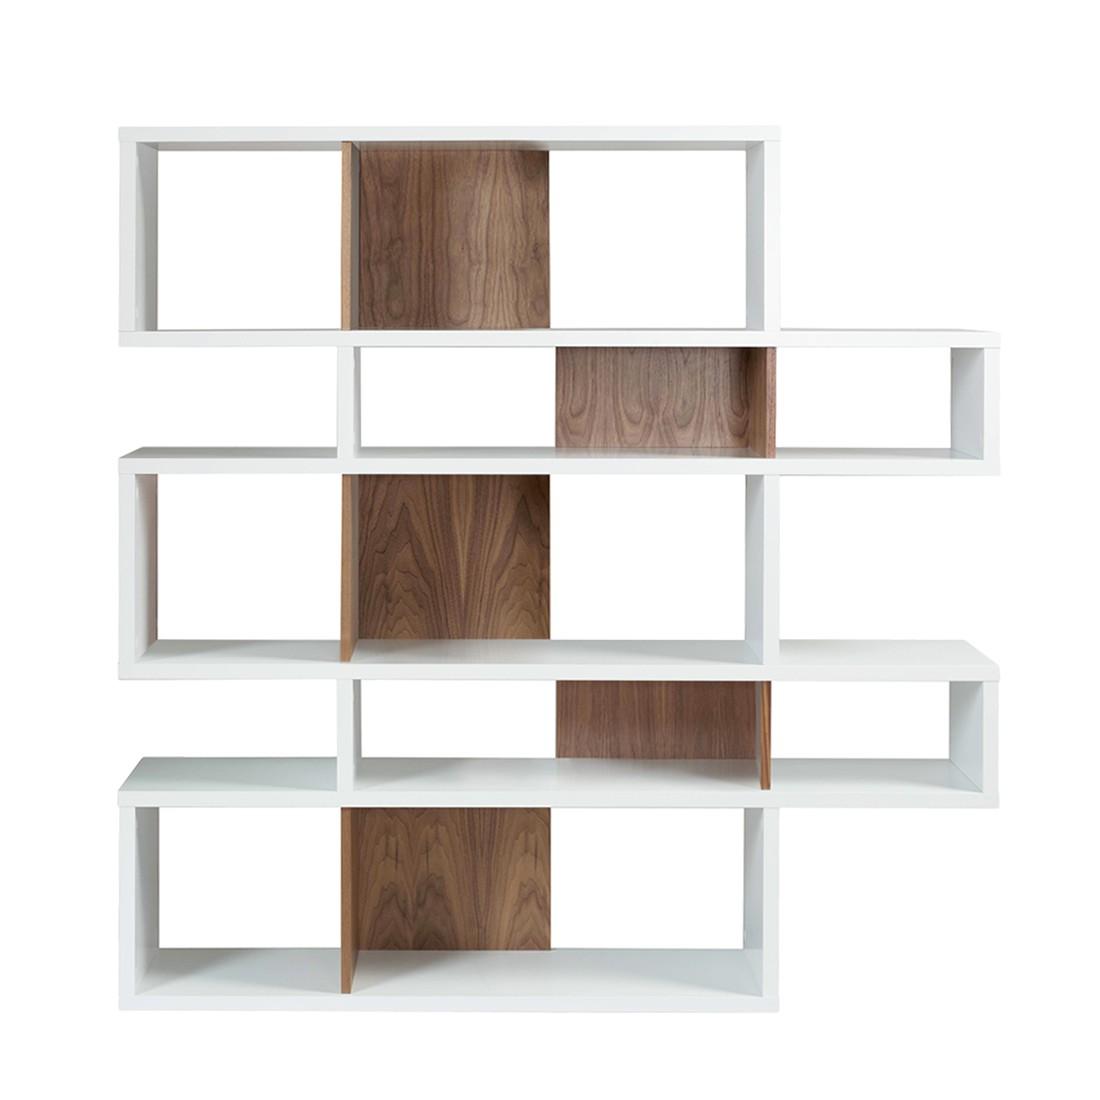 regal london ii mattwei nussbaum echtholzfunier temahome g nstig online kaufen. Black Bedroom Furniture Sets. Home Design Ideas